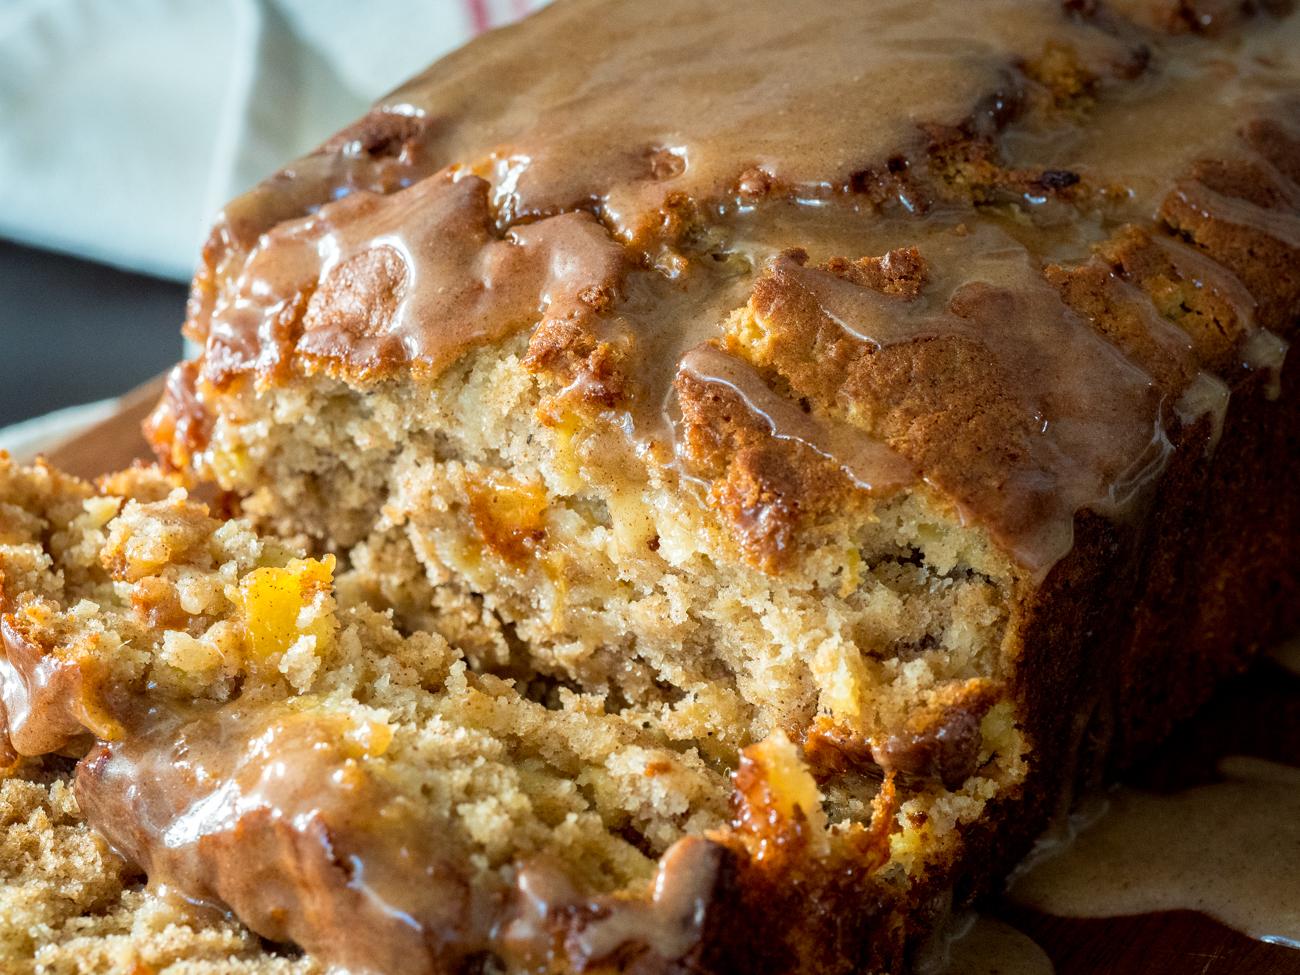 Cinnamon Pineapple Bread Horizontal 4